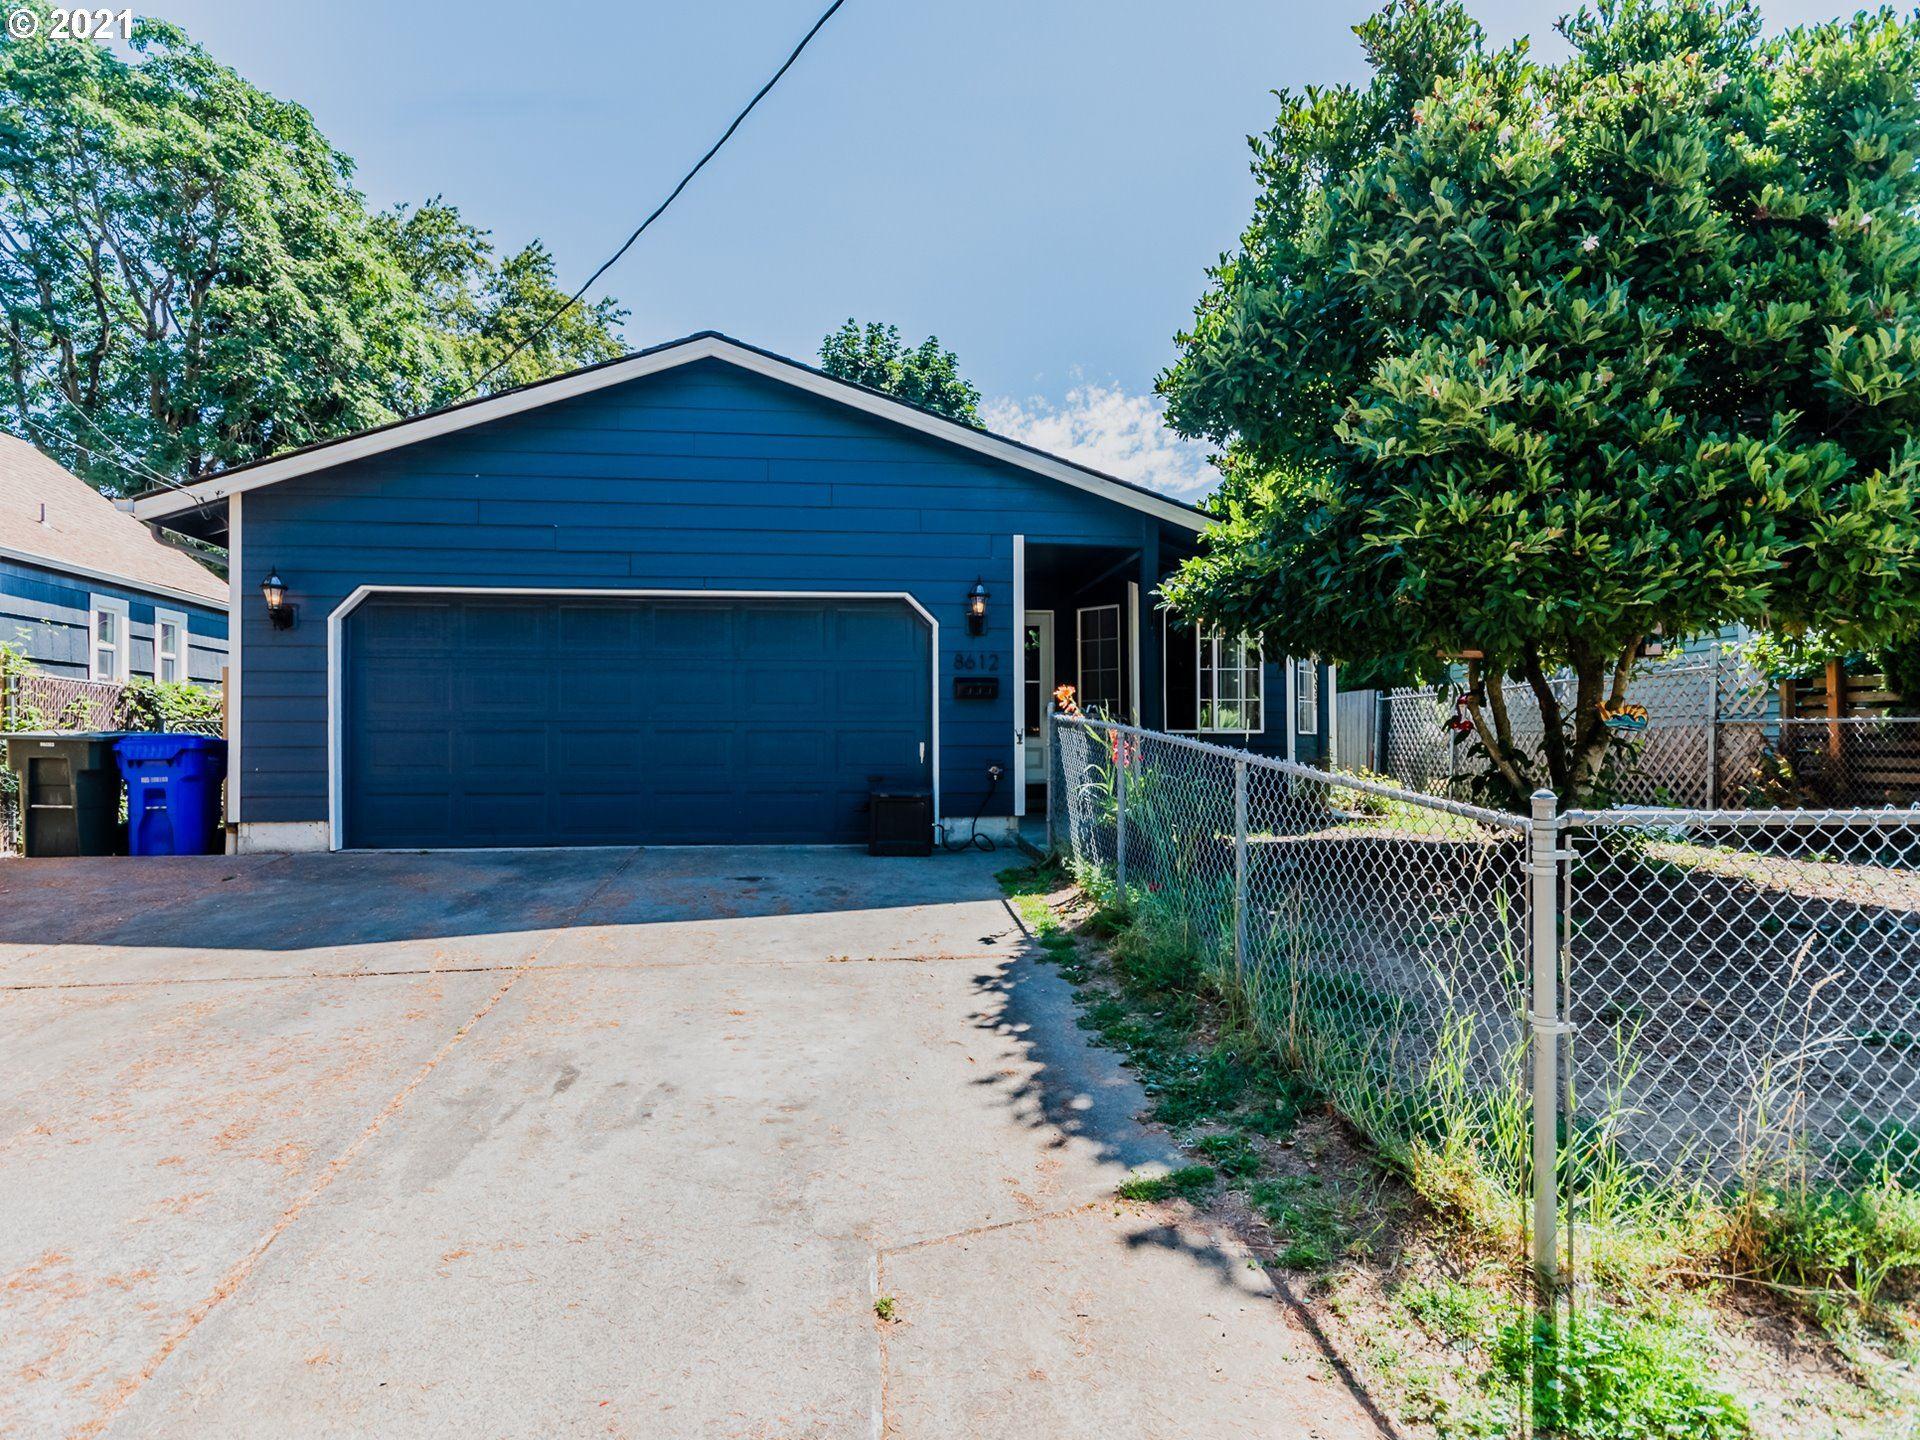 8612 N BAYARD AVE, Portland, OR 97217 - MLS#: 21574371